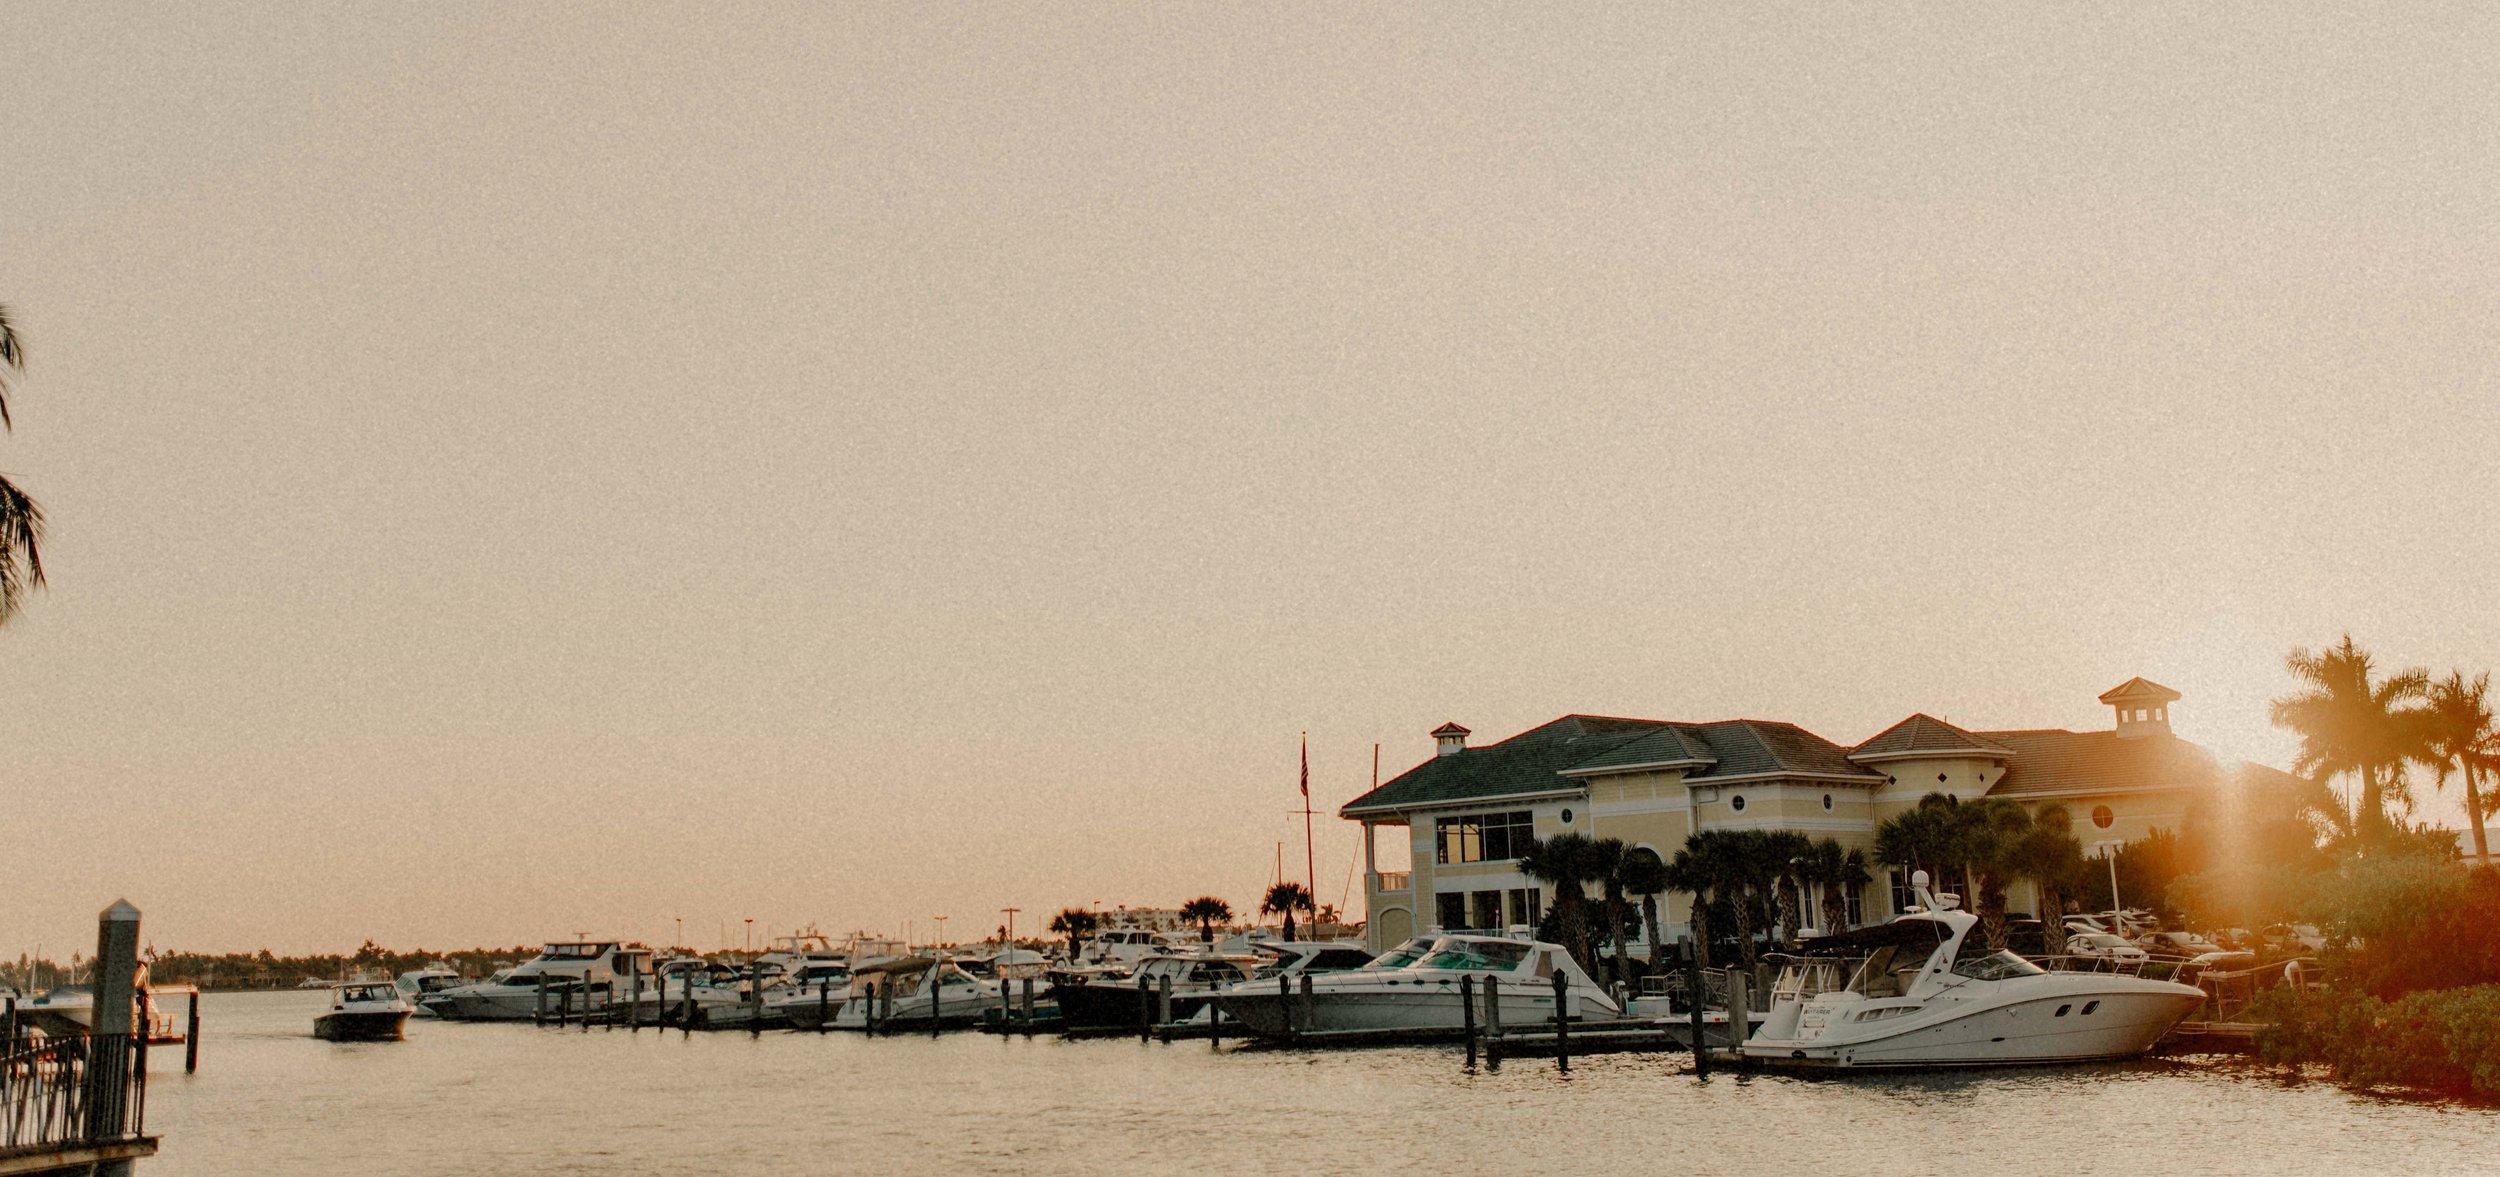 Naples Bay Resort Hotel & Spa Sunset view